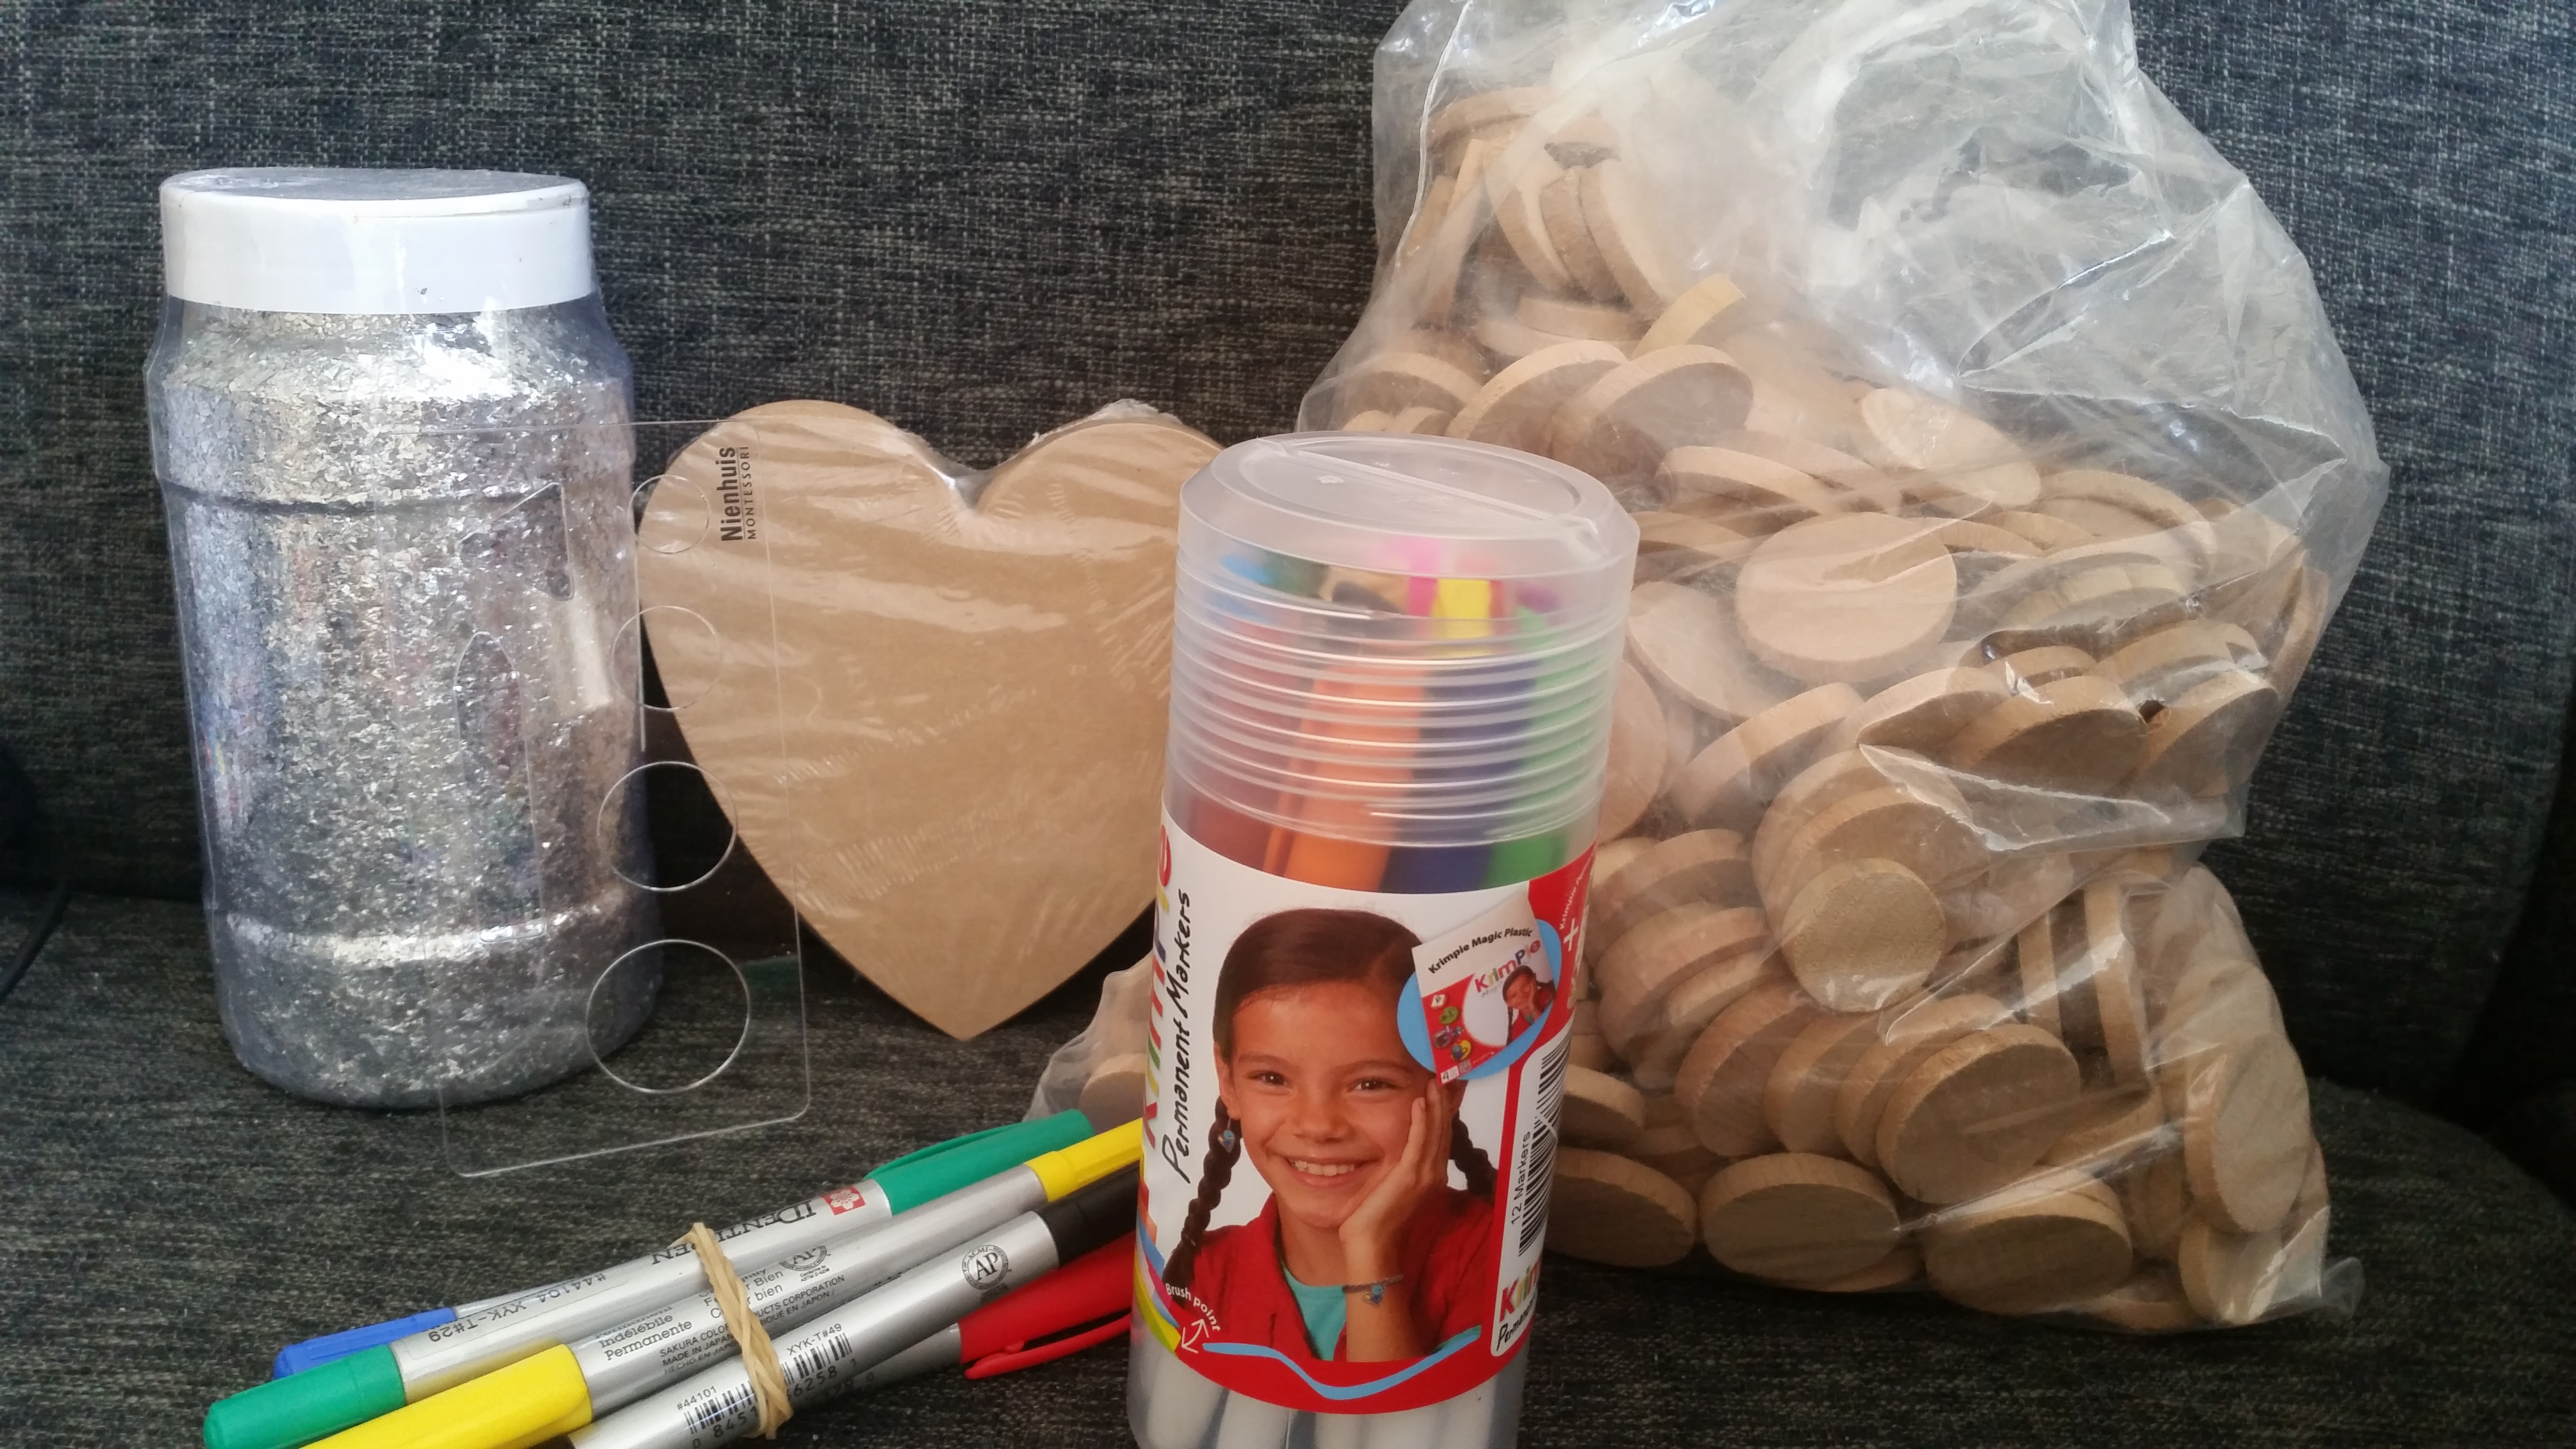 6-16-heutink-flessen-flacon-verf-mooi-kleuren-groothandel-particulieren-particulier-tip-gastouders-nanny-amsterdam-toy-color-uitwasbaar-textielverf-glitters-glas-cirkel-sjabloon-hart-hout